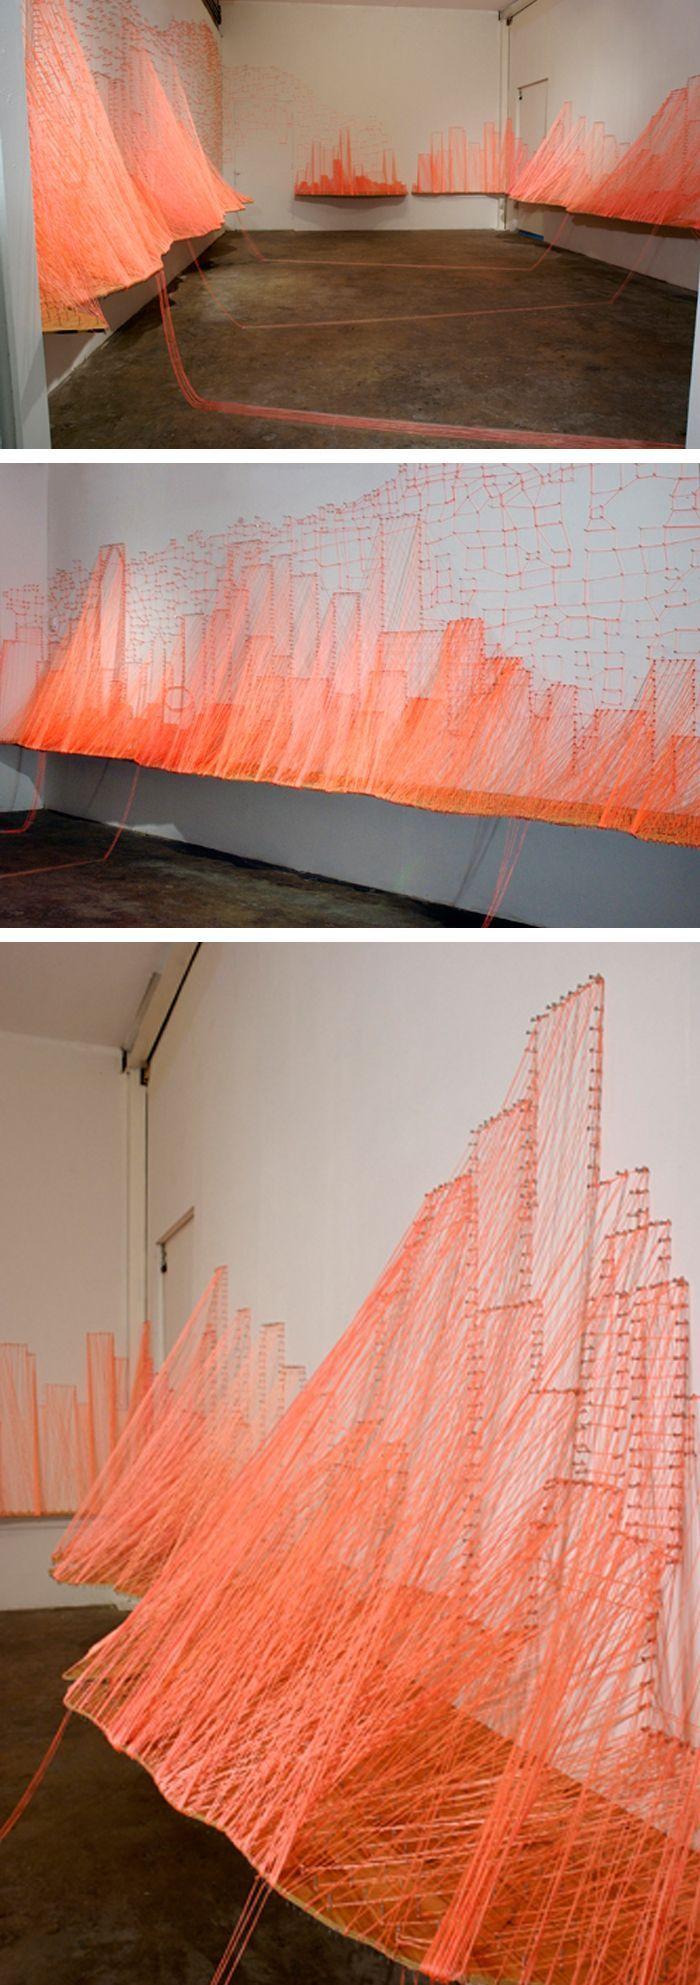 Aili Schmeltz - The Magic City String Art Installation (via All Sorts of Pretty)